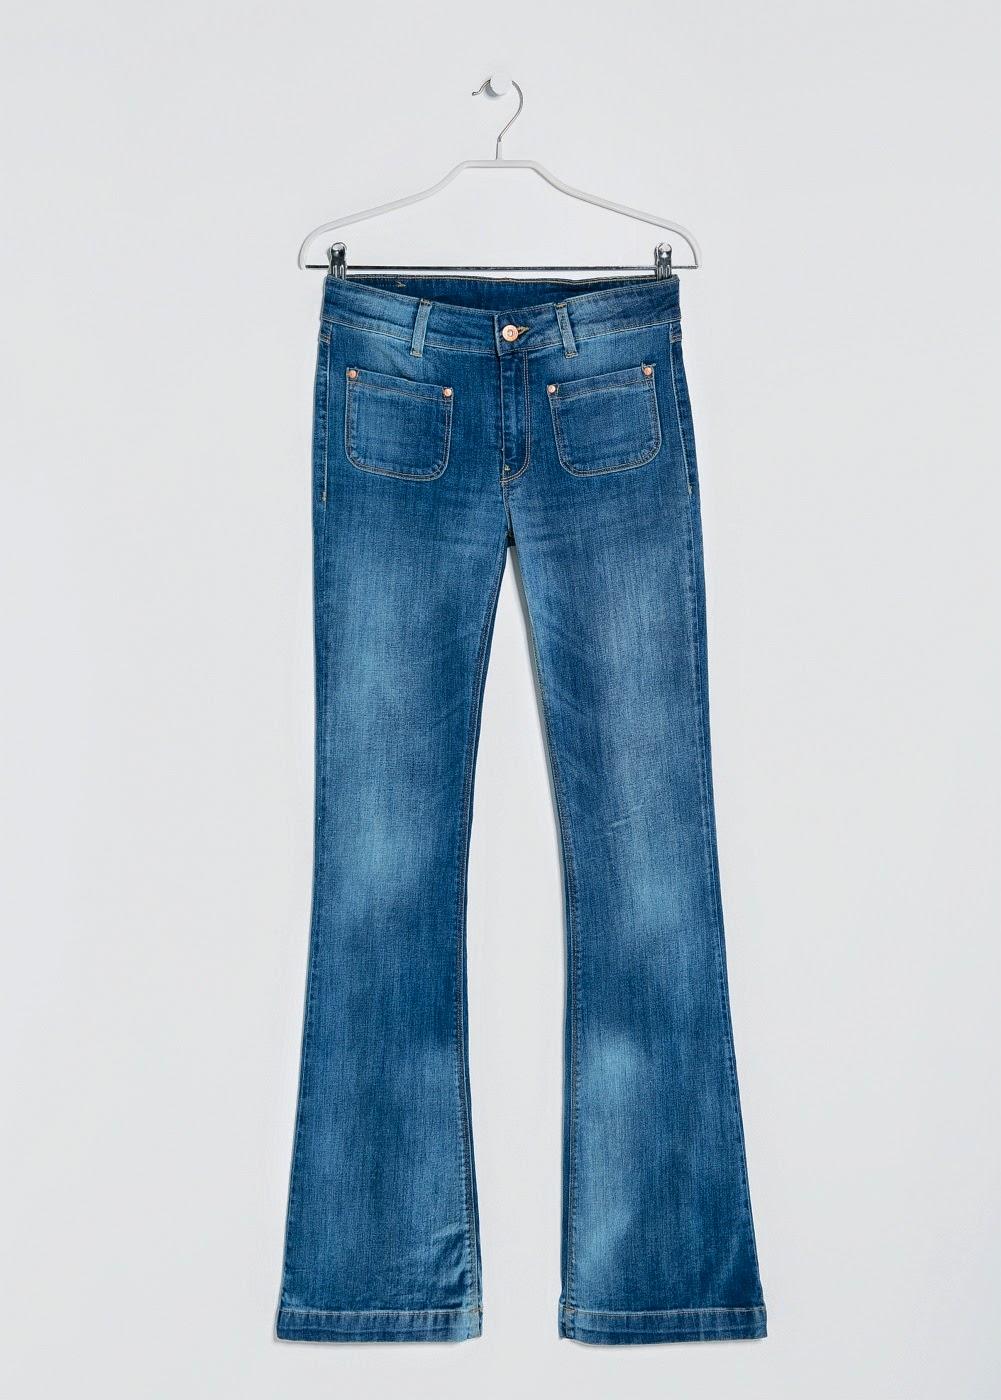 http://shop.mango.com/ES/p0/mujer/prendas/jeans/jeans-acampanados-flare/?id=23063524_TM&n=1&s=prendas.tejanos&ident=0__0_1405512572623&ts=1405512572623